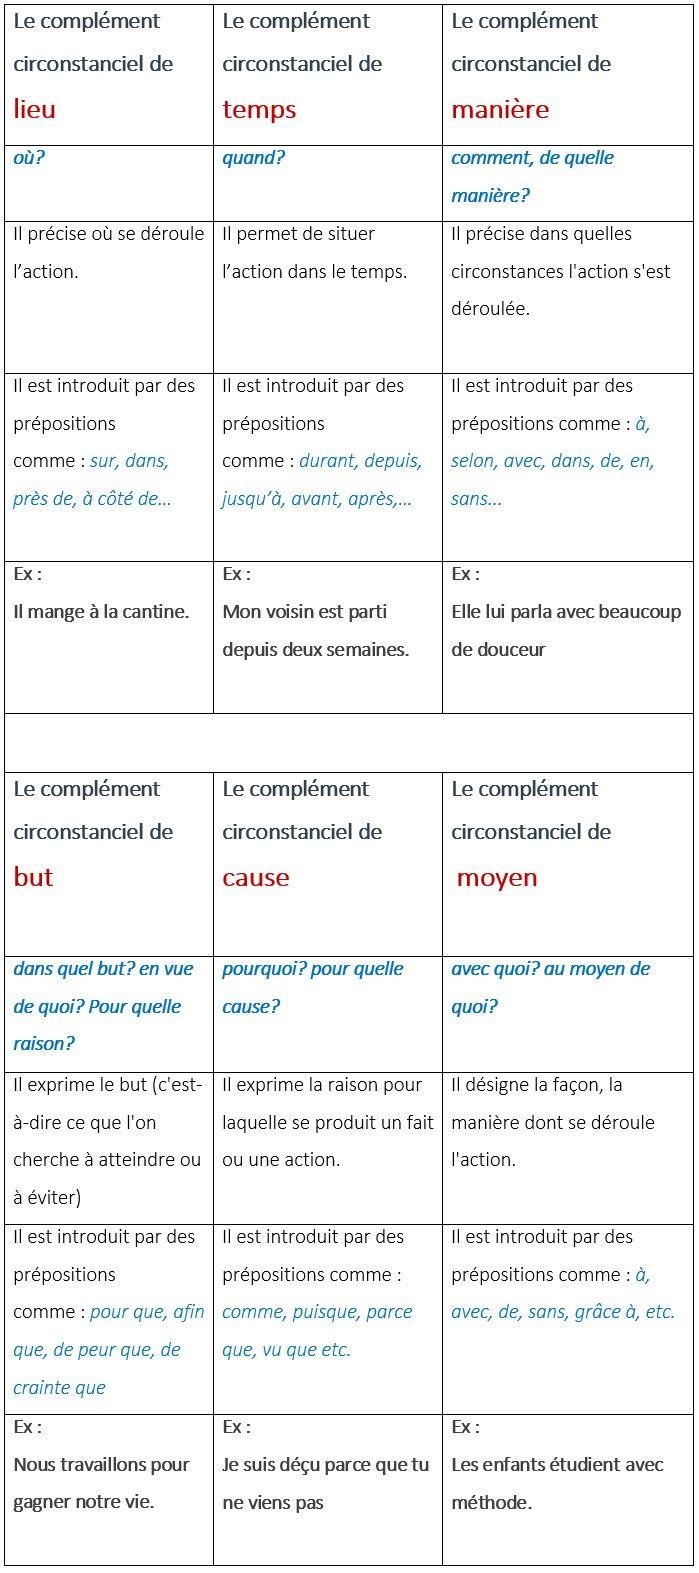 Compléments circonstanciels - learn French,complements,circonstanciels,grammaire,francais